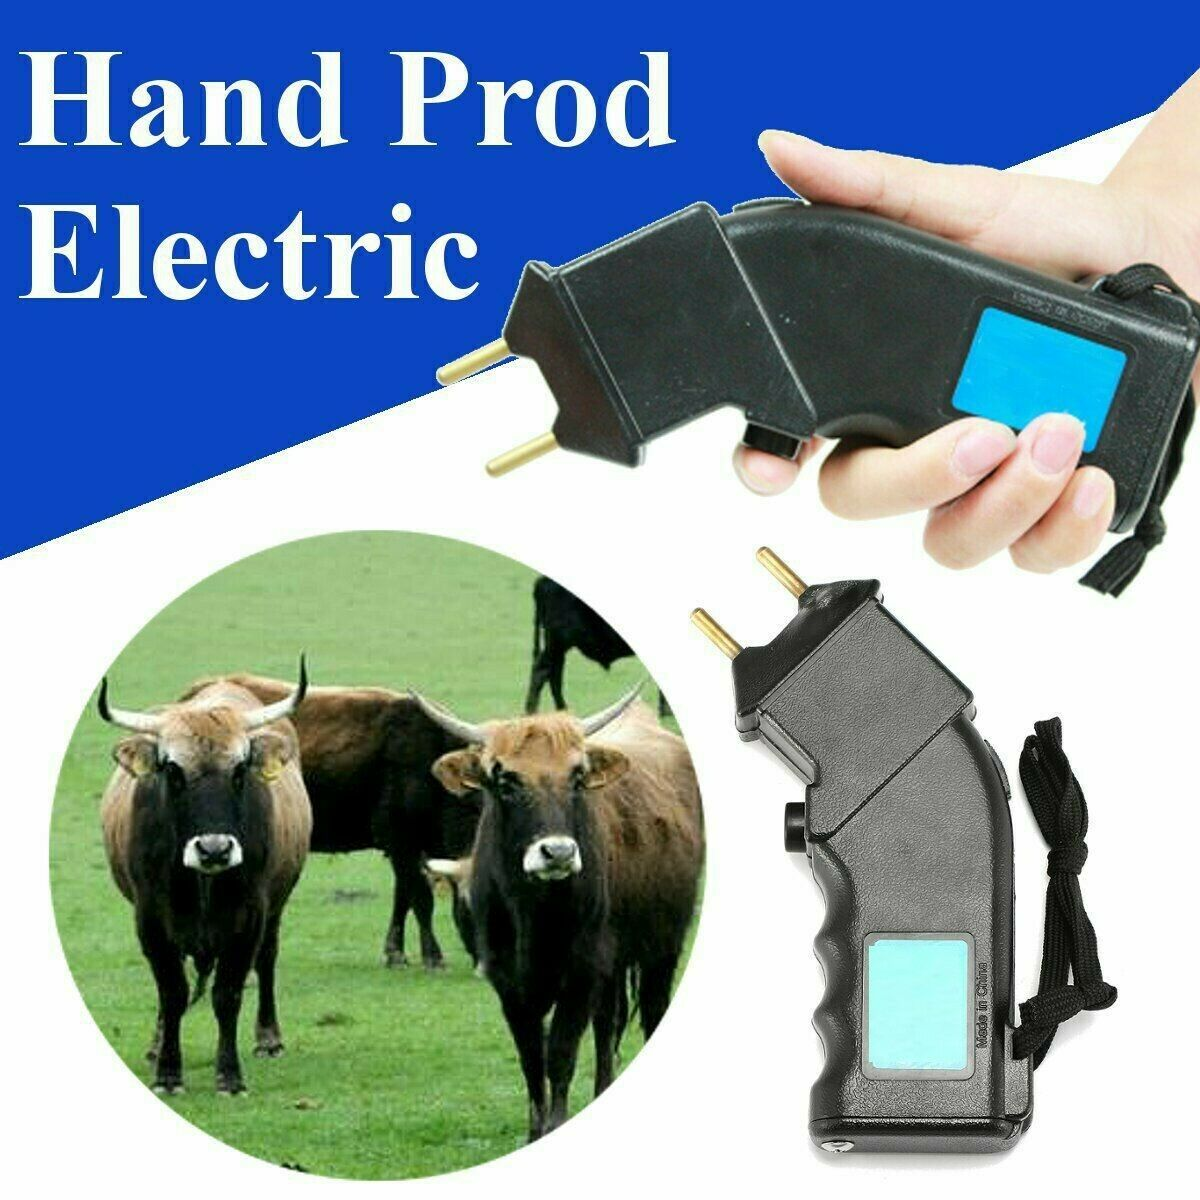 4000V/ Shock Handheld Cow Livestock Stock Tool Electric Cattle Prod Prodder